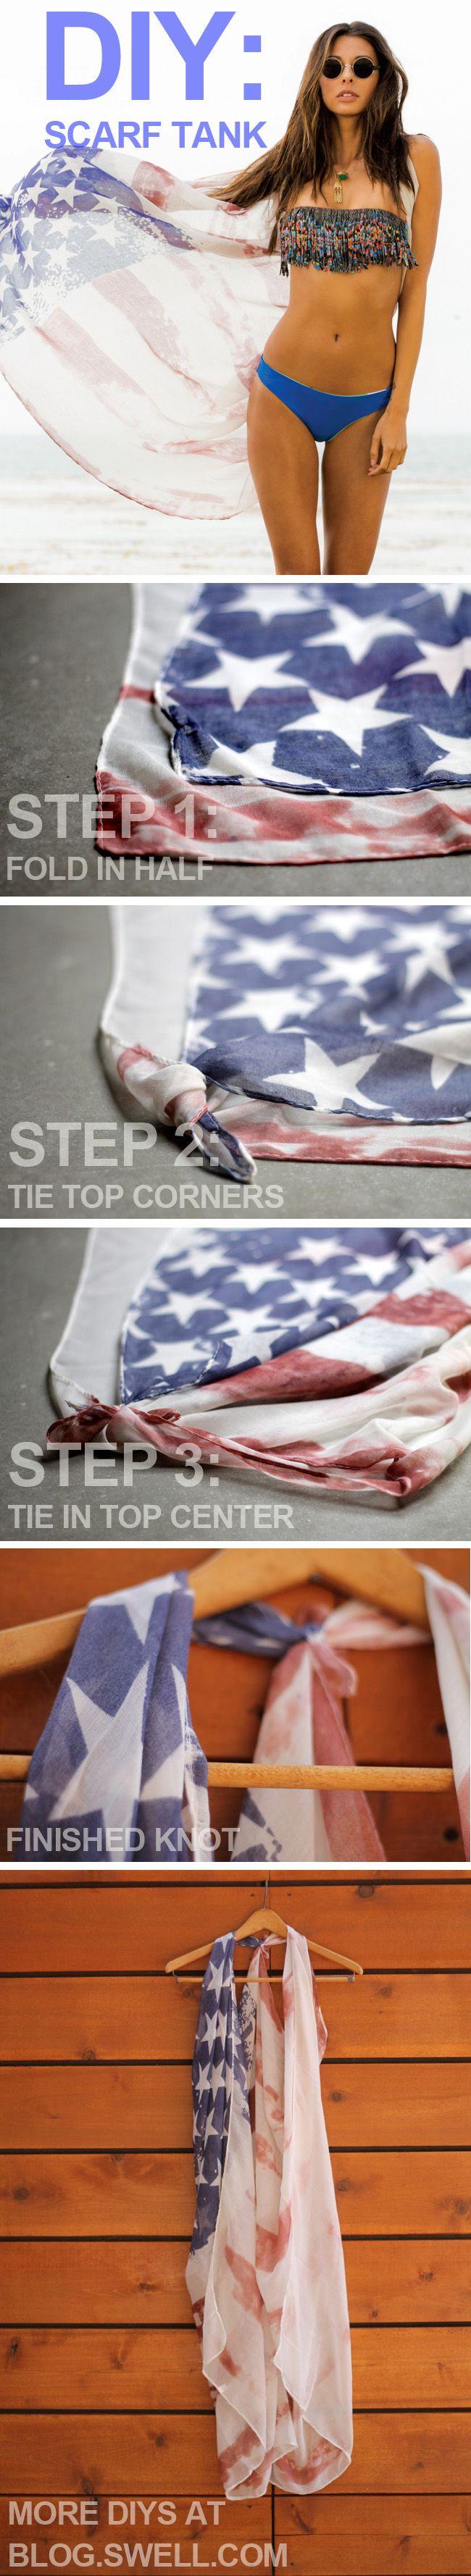 DIY: Tie a Scarf into a Racerback Cover-Up/Vest